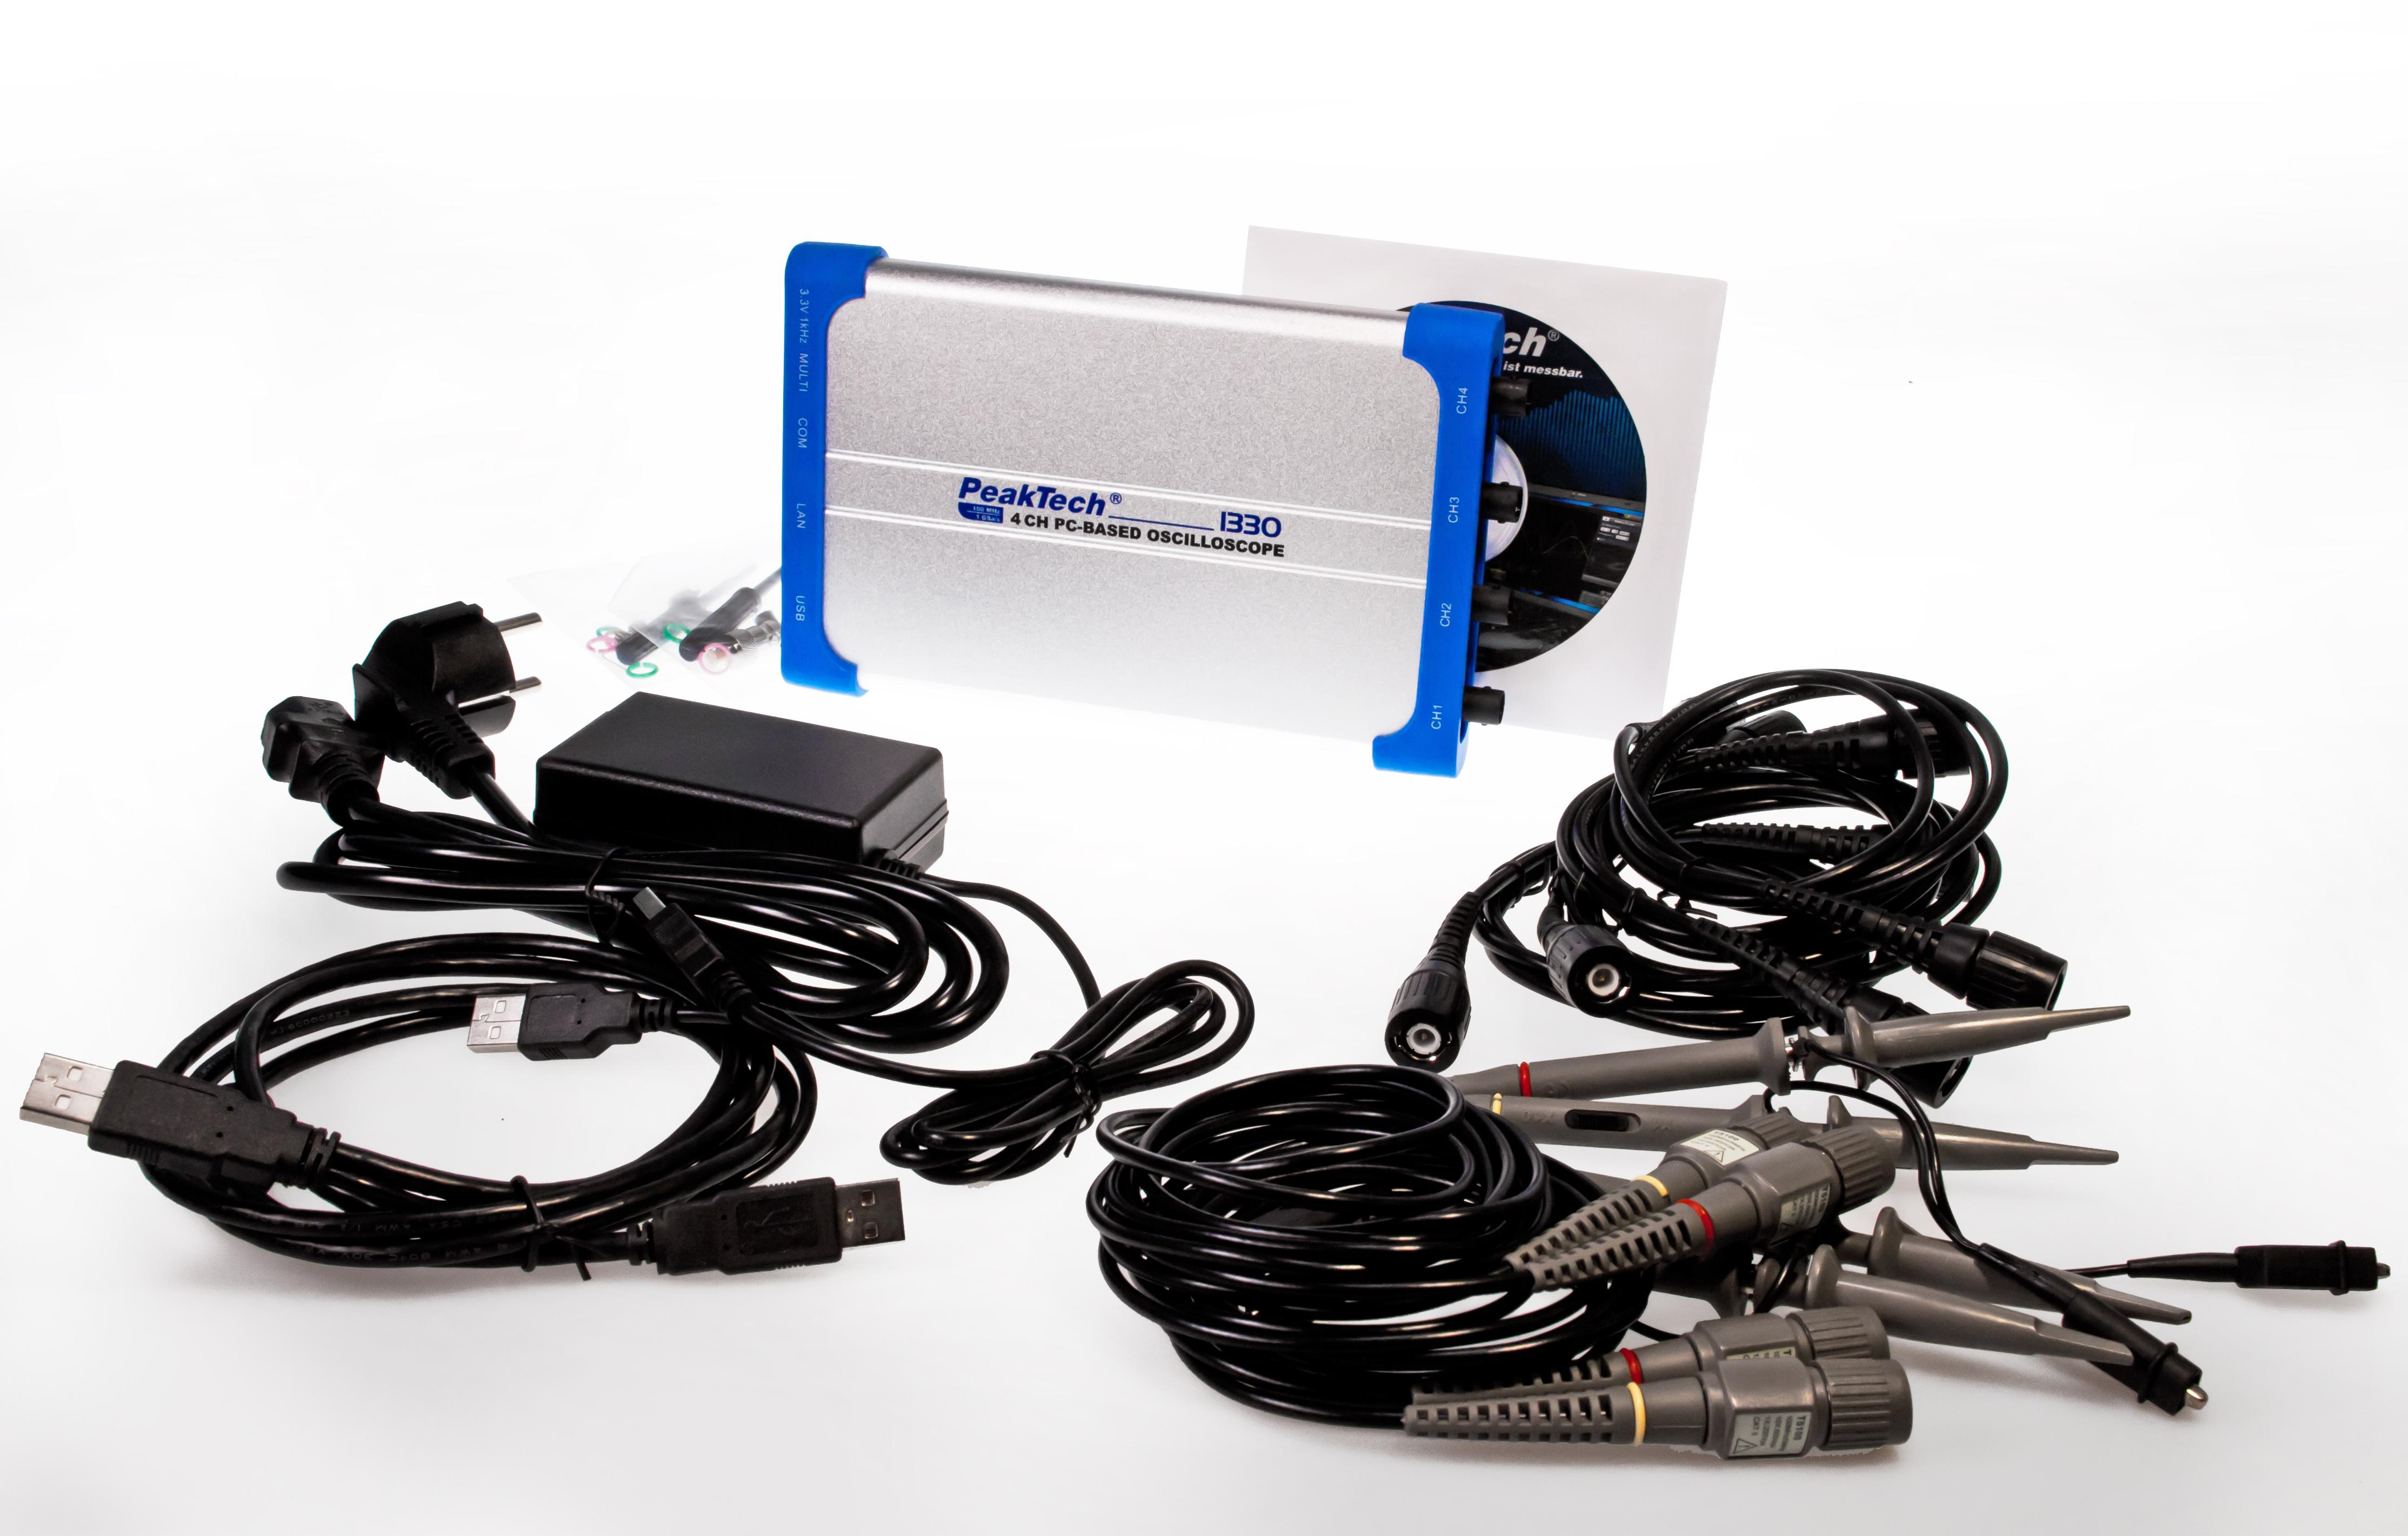 «PeakTech® P 1330» 100 MHz / 4 CH, 1 GS/s PC oscilloscope, USB & LAN